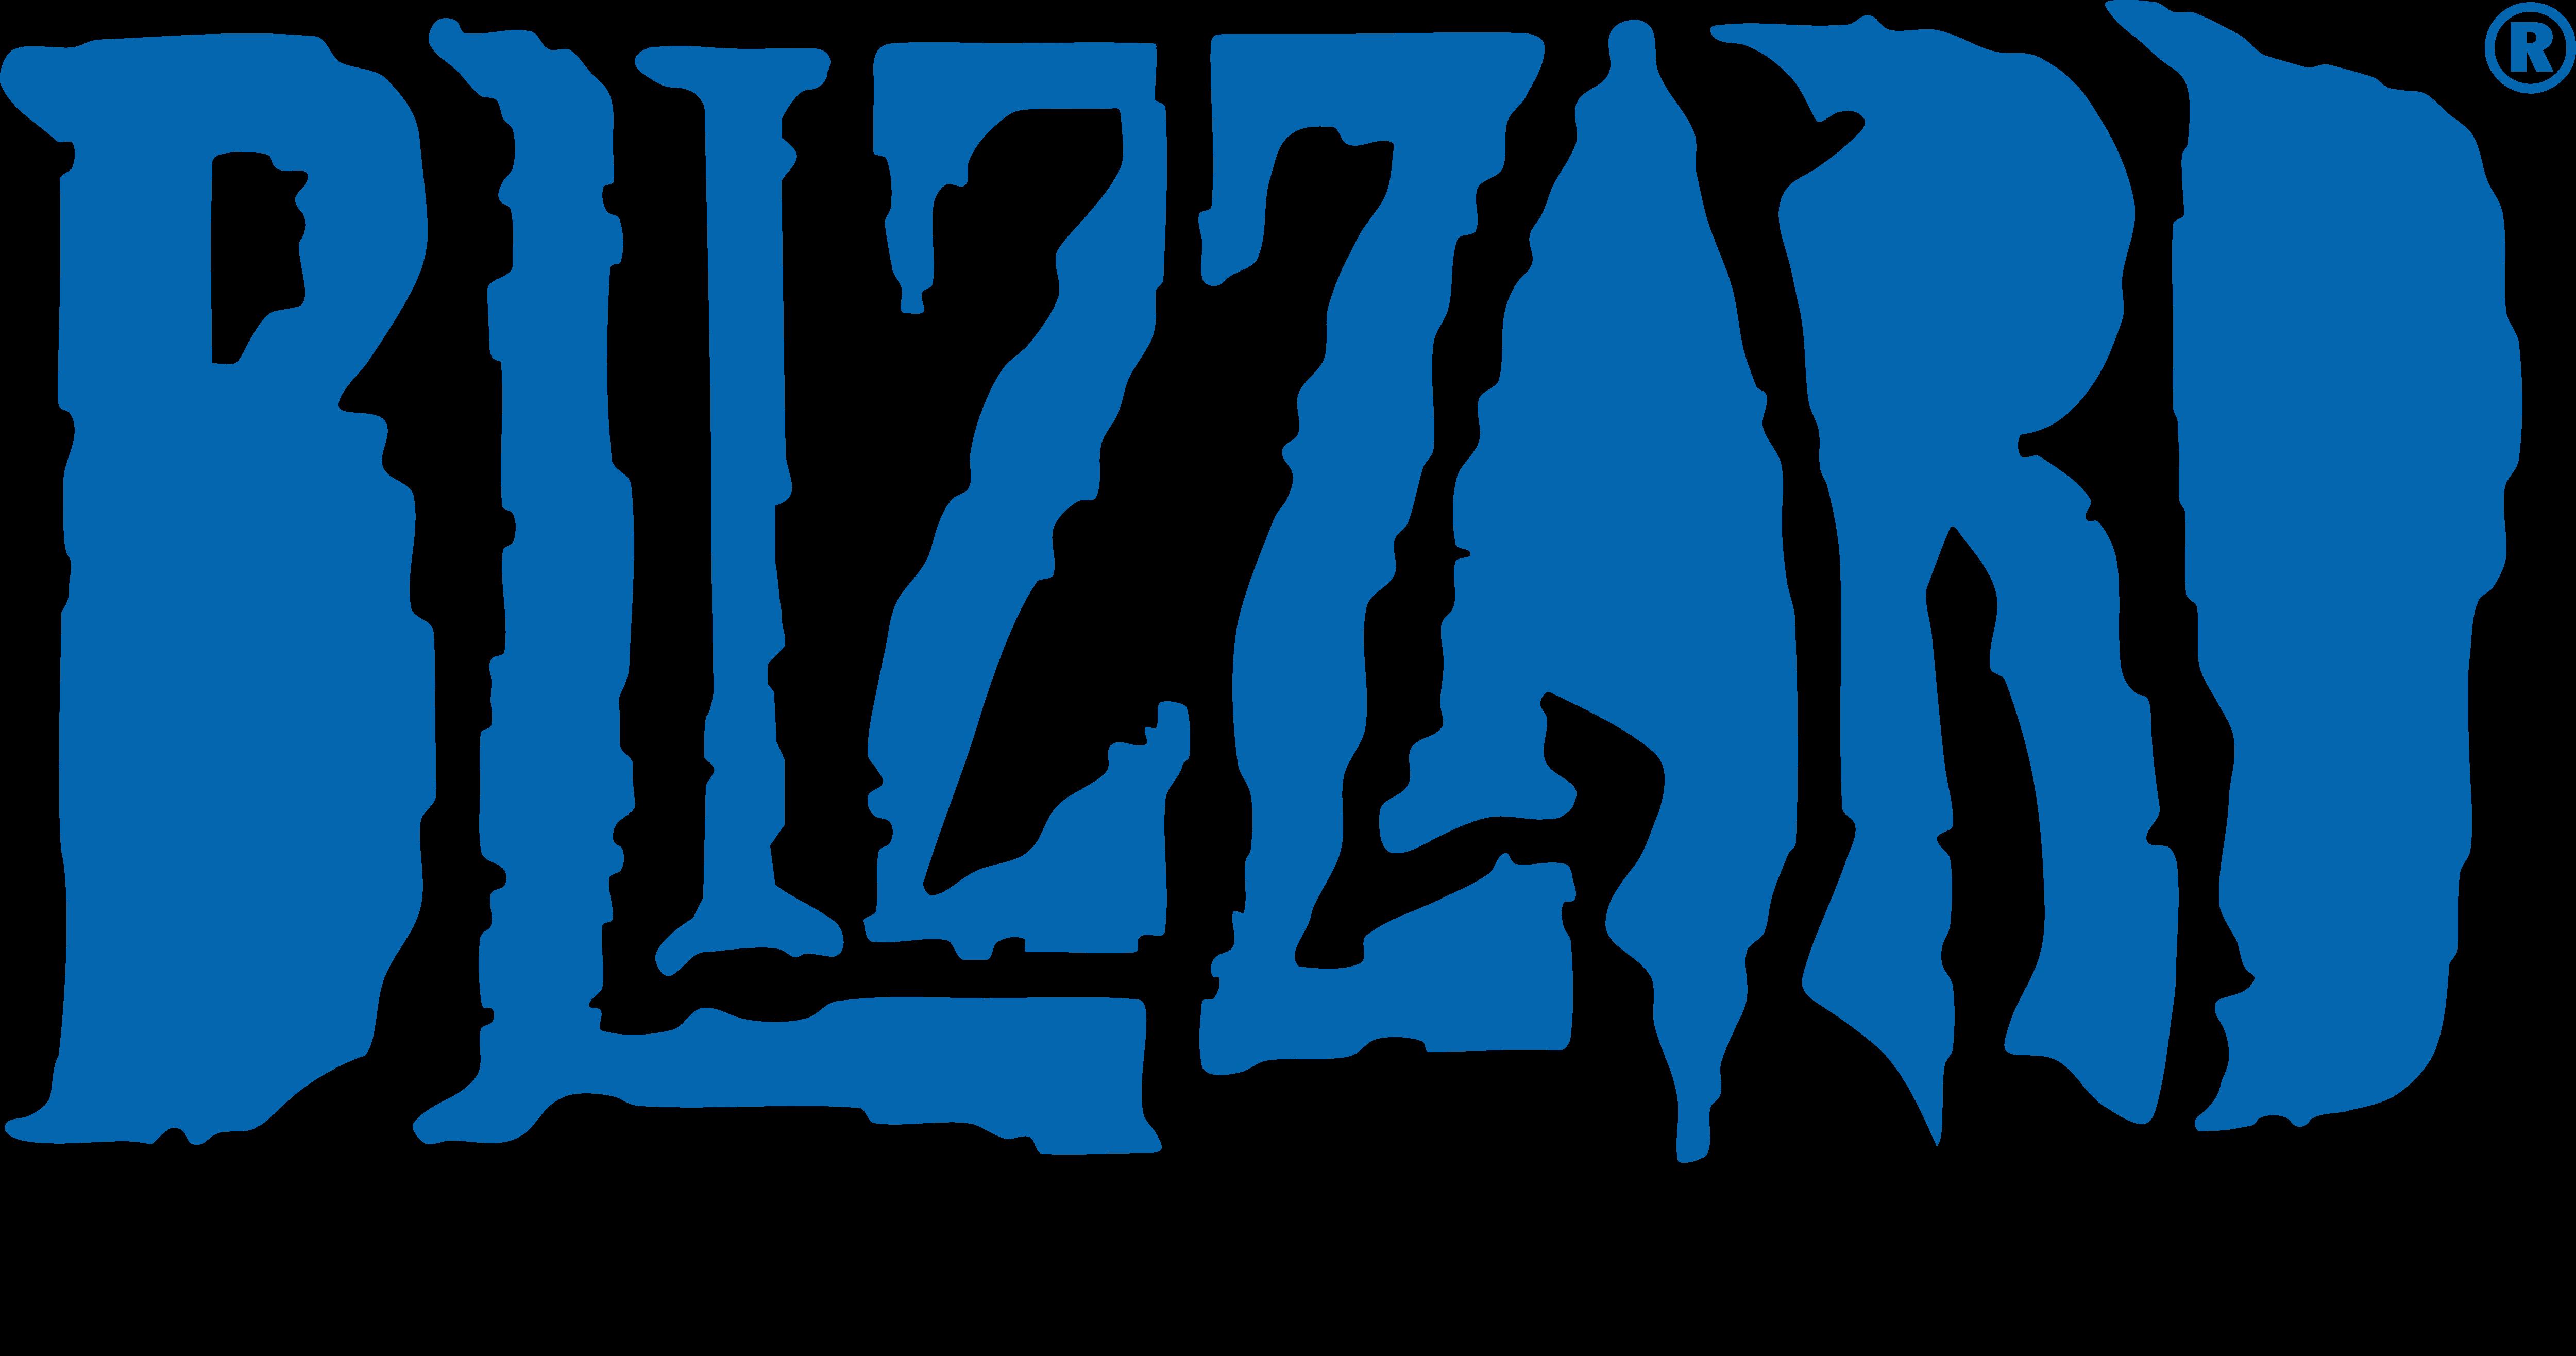 Download Blizzard Entertainment Logo Png Image For Free Entertainment Logo Blizzard Entertainment Png Images